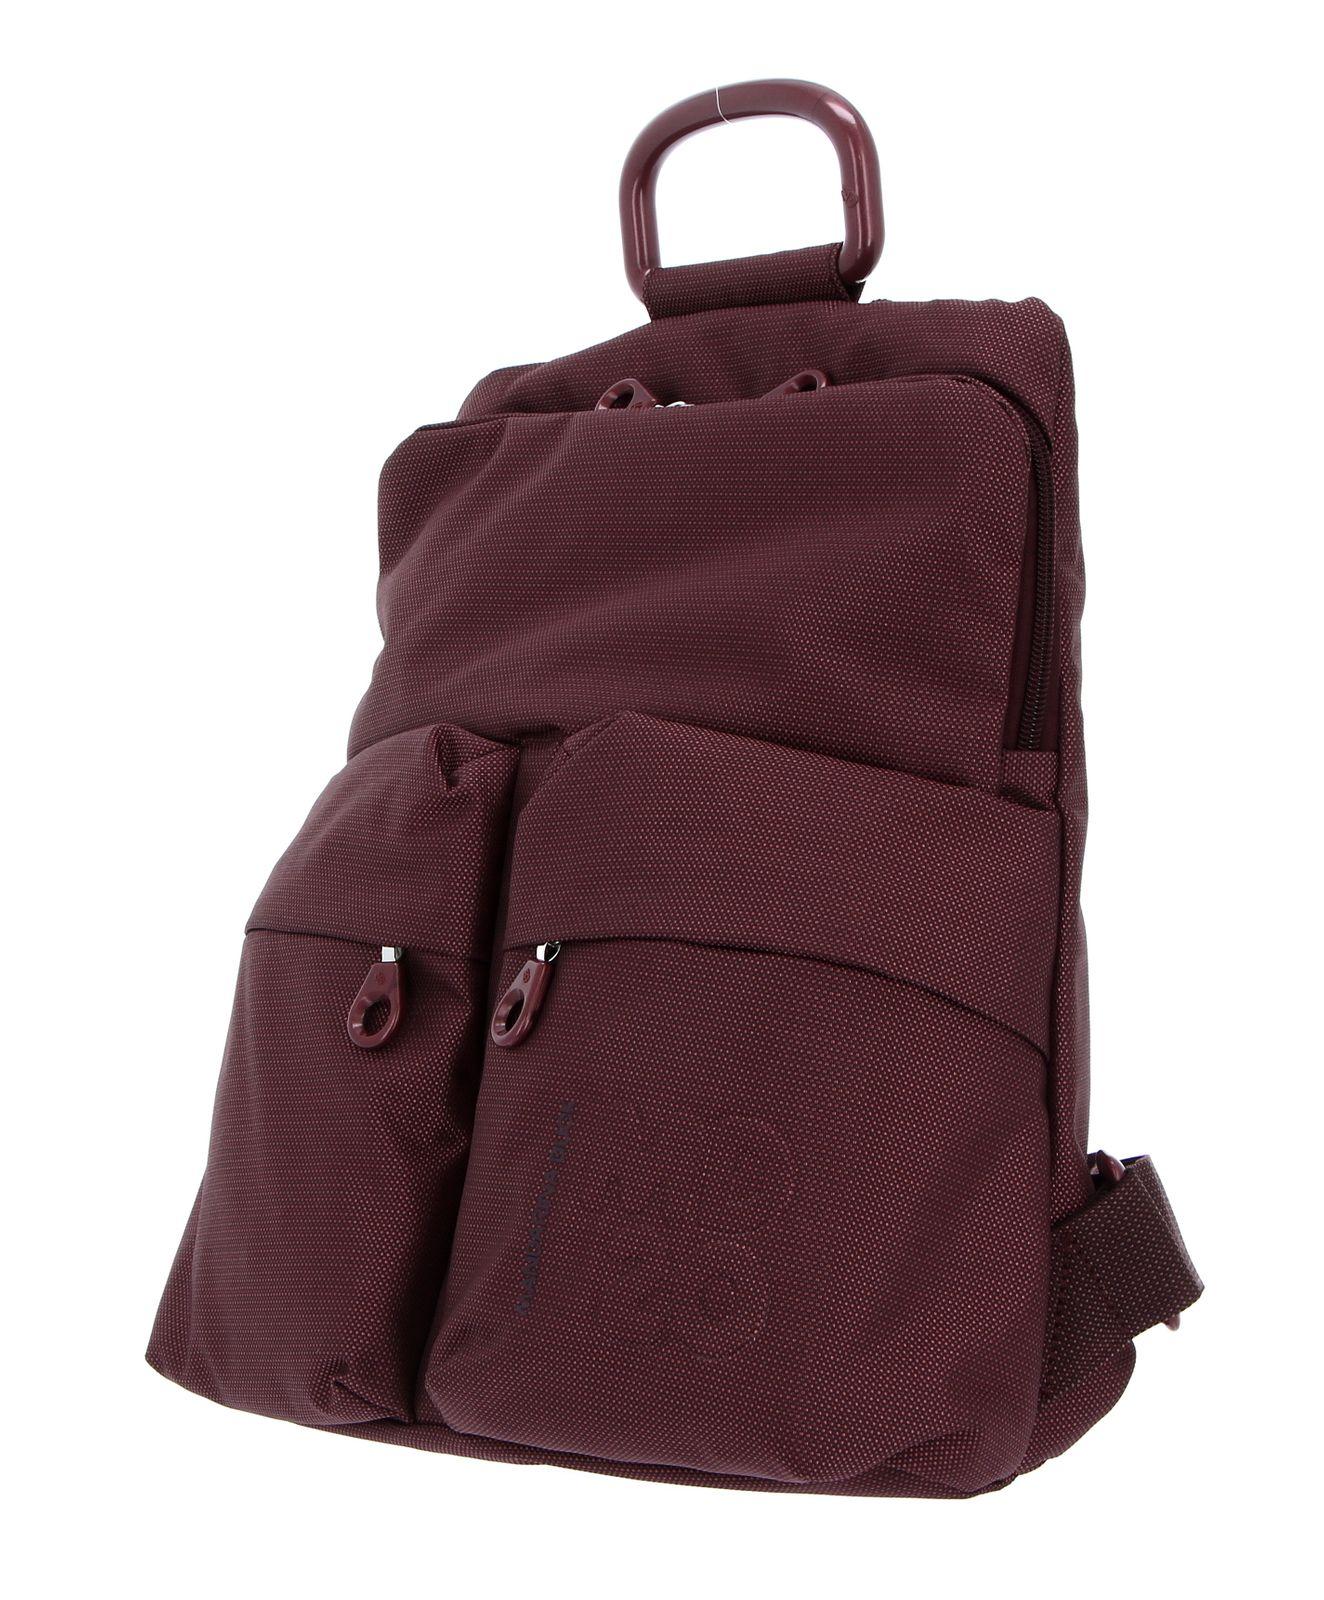 MANDARINA DUCK MD20 Backpack M Mahogany